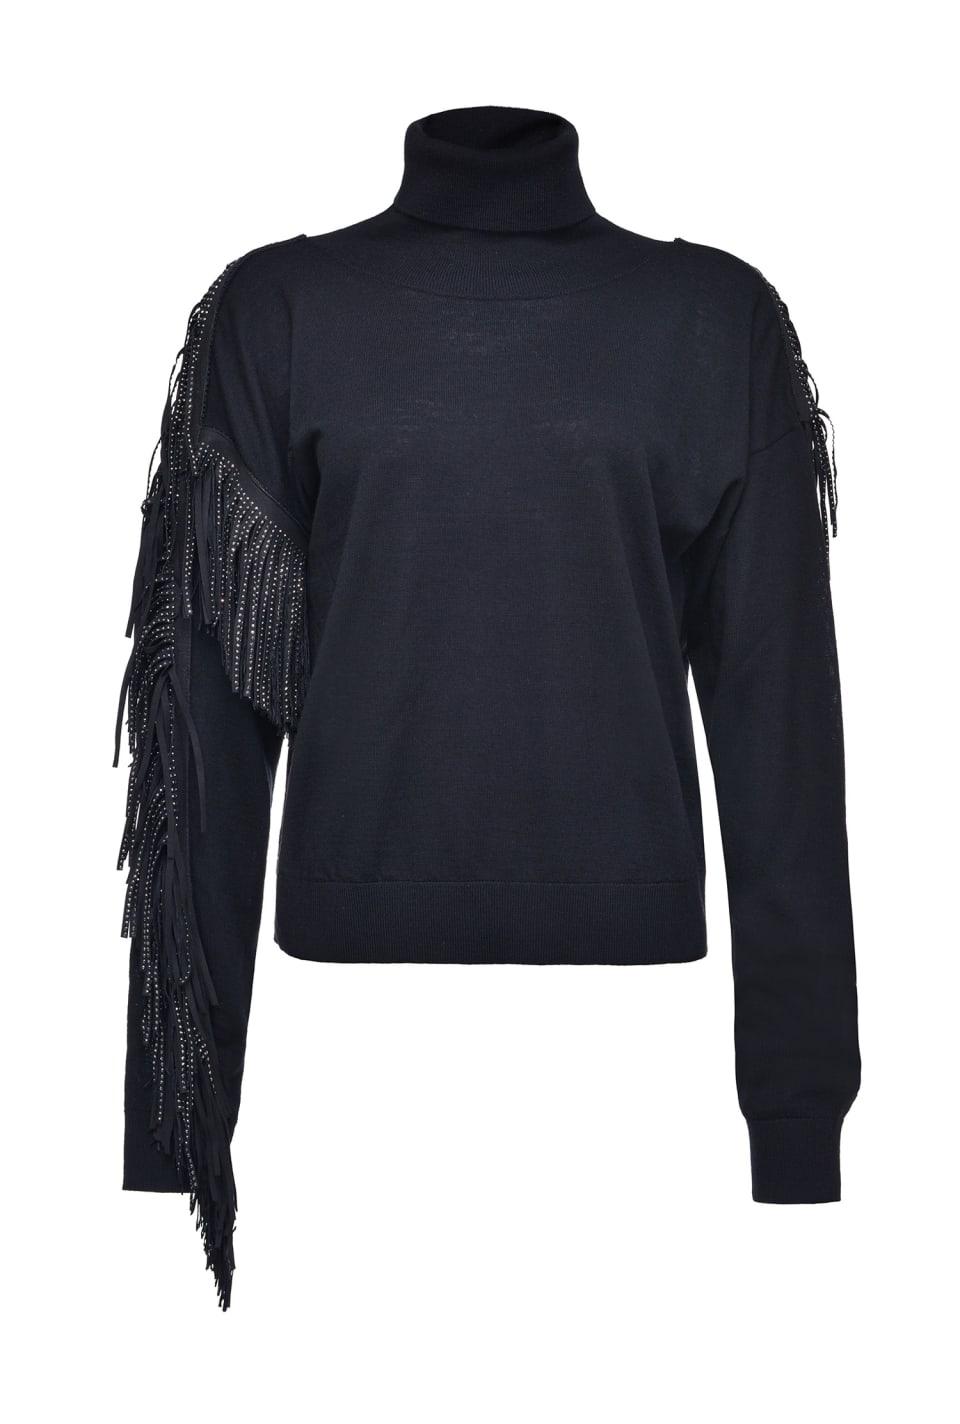 Rhinestone fringe pullover - Pinko